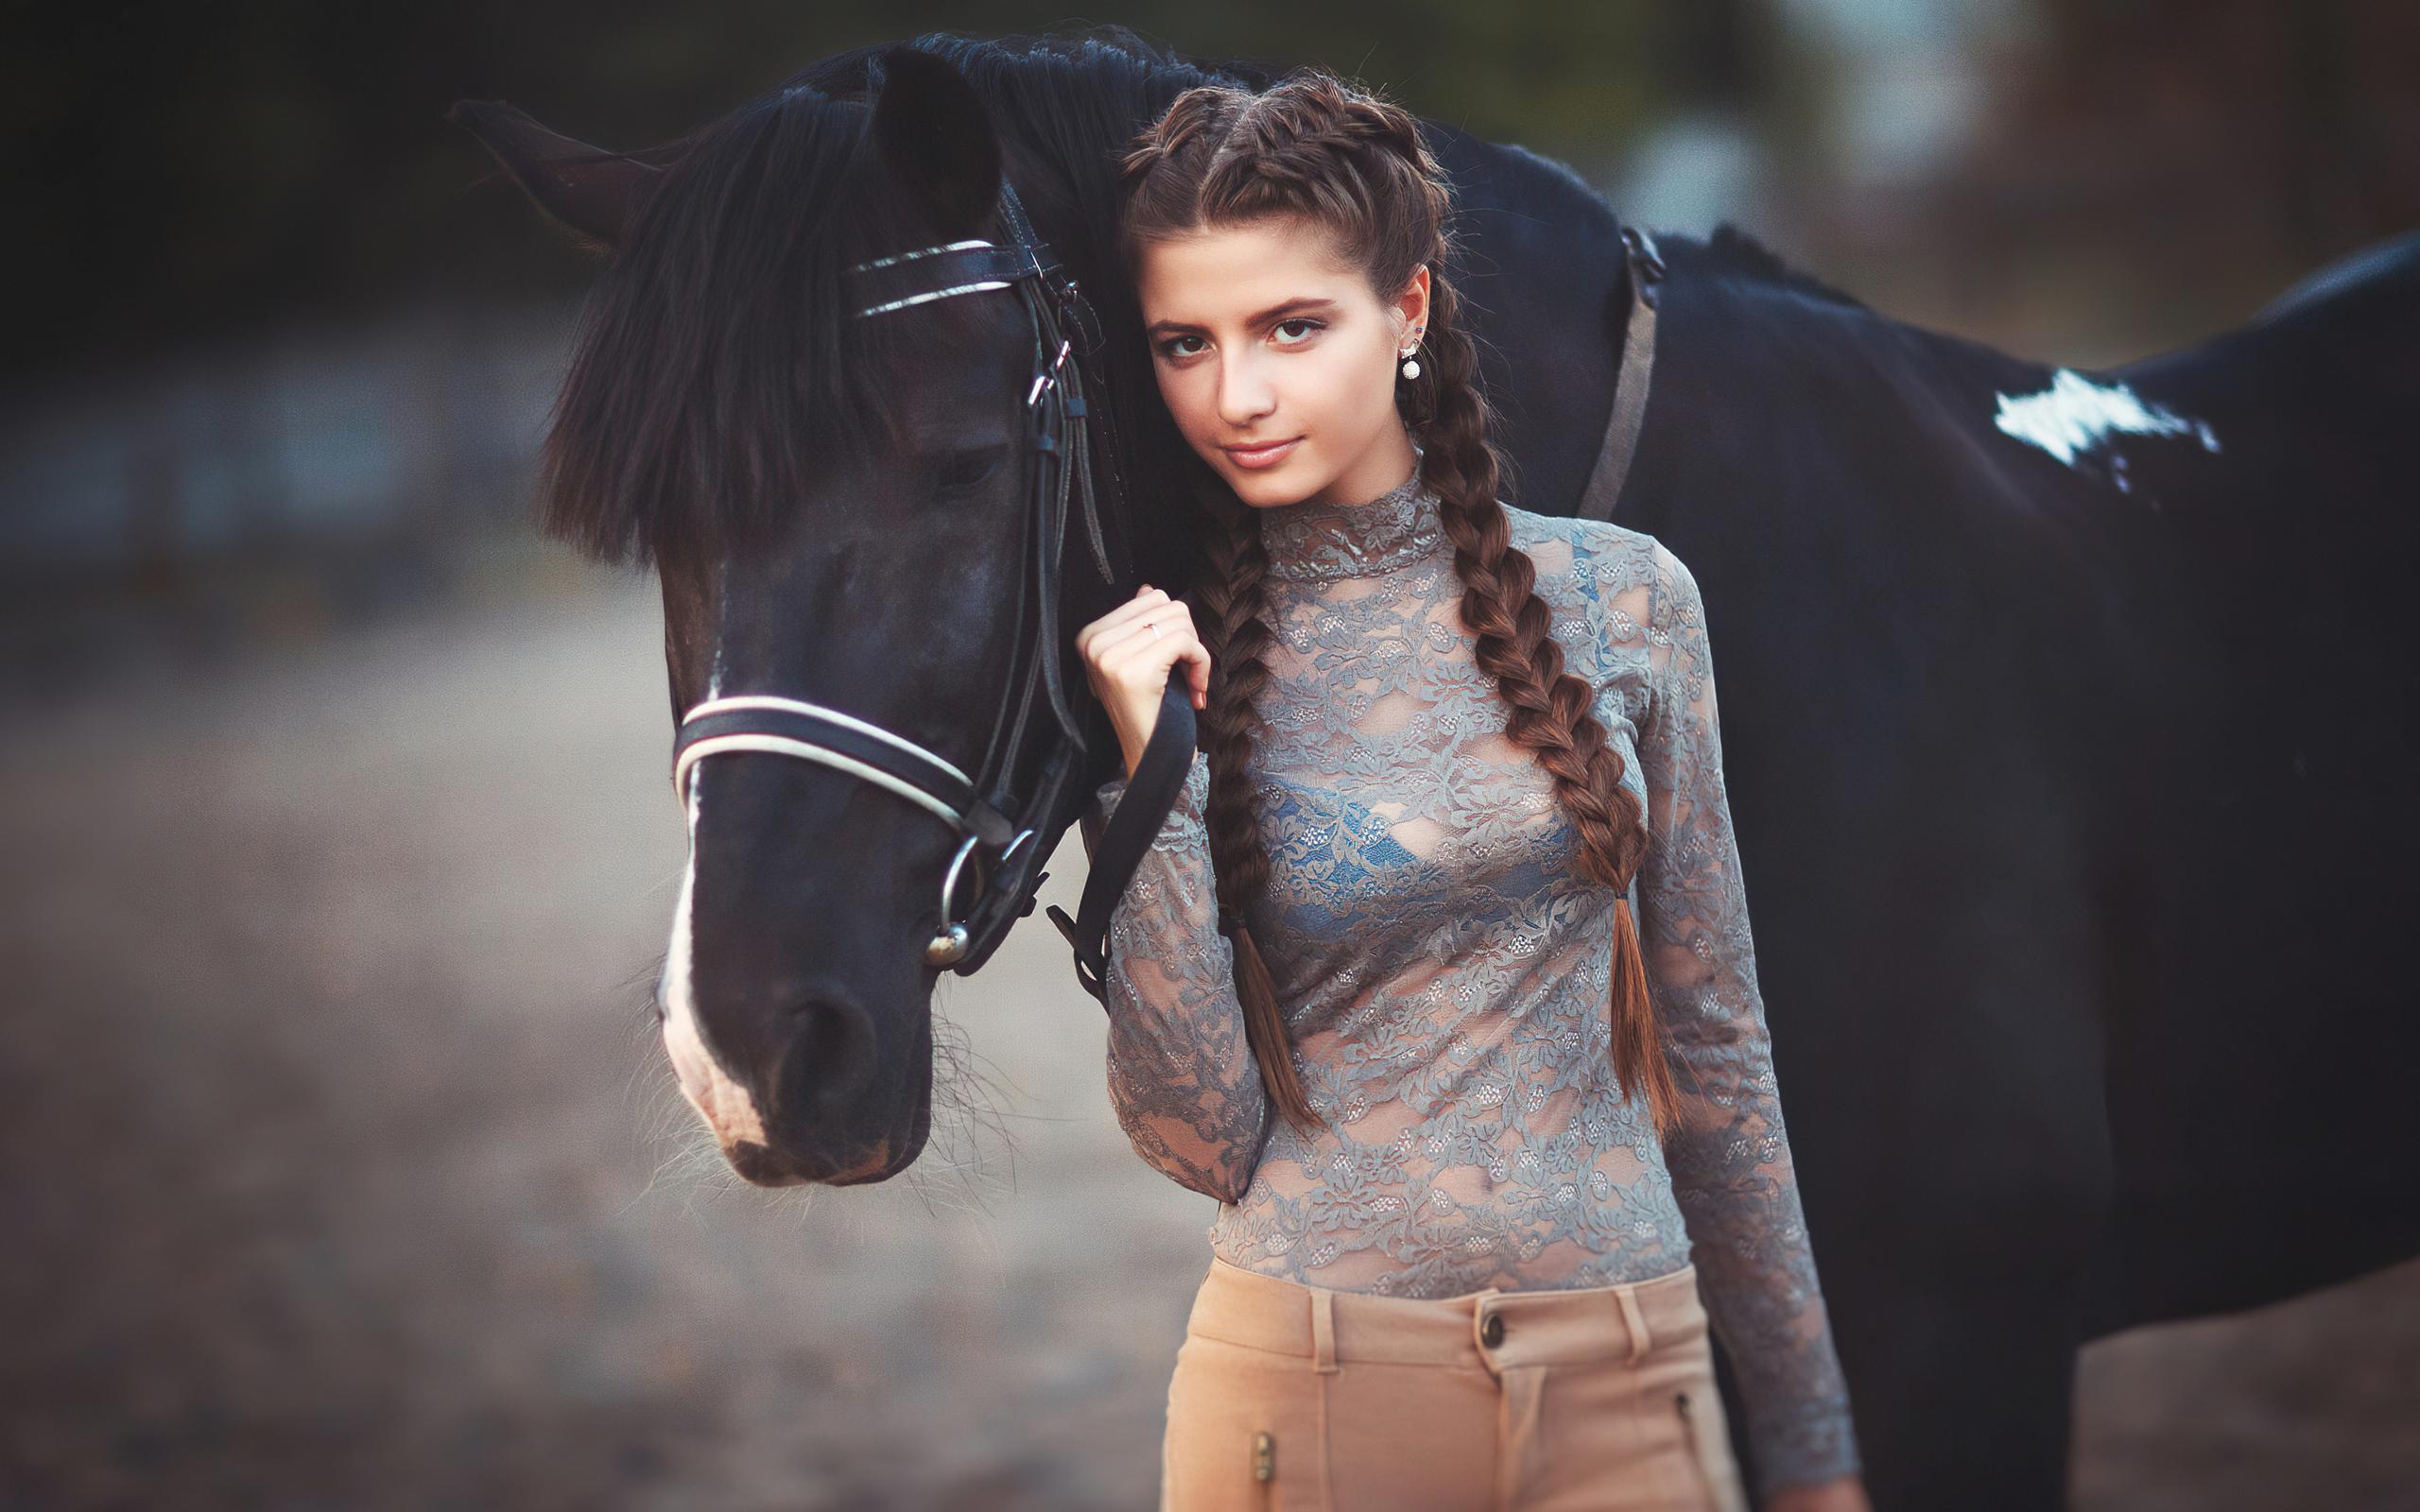 girl-standing-with-horse-4k-ck.jpg